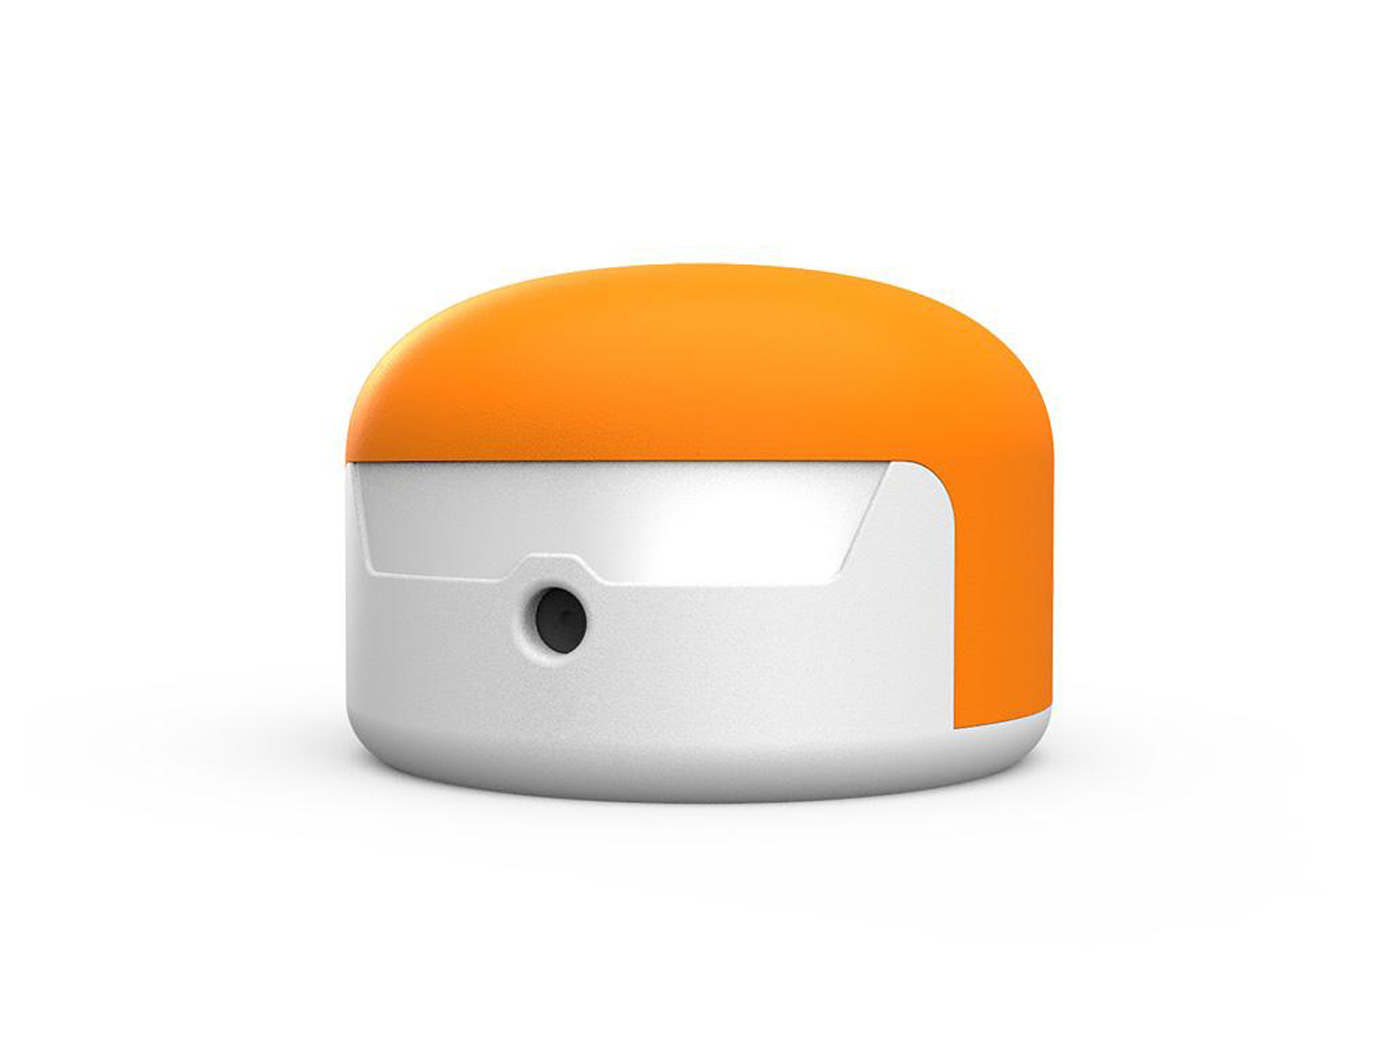 MU - A Smart Vision Sensor